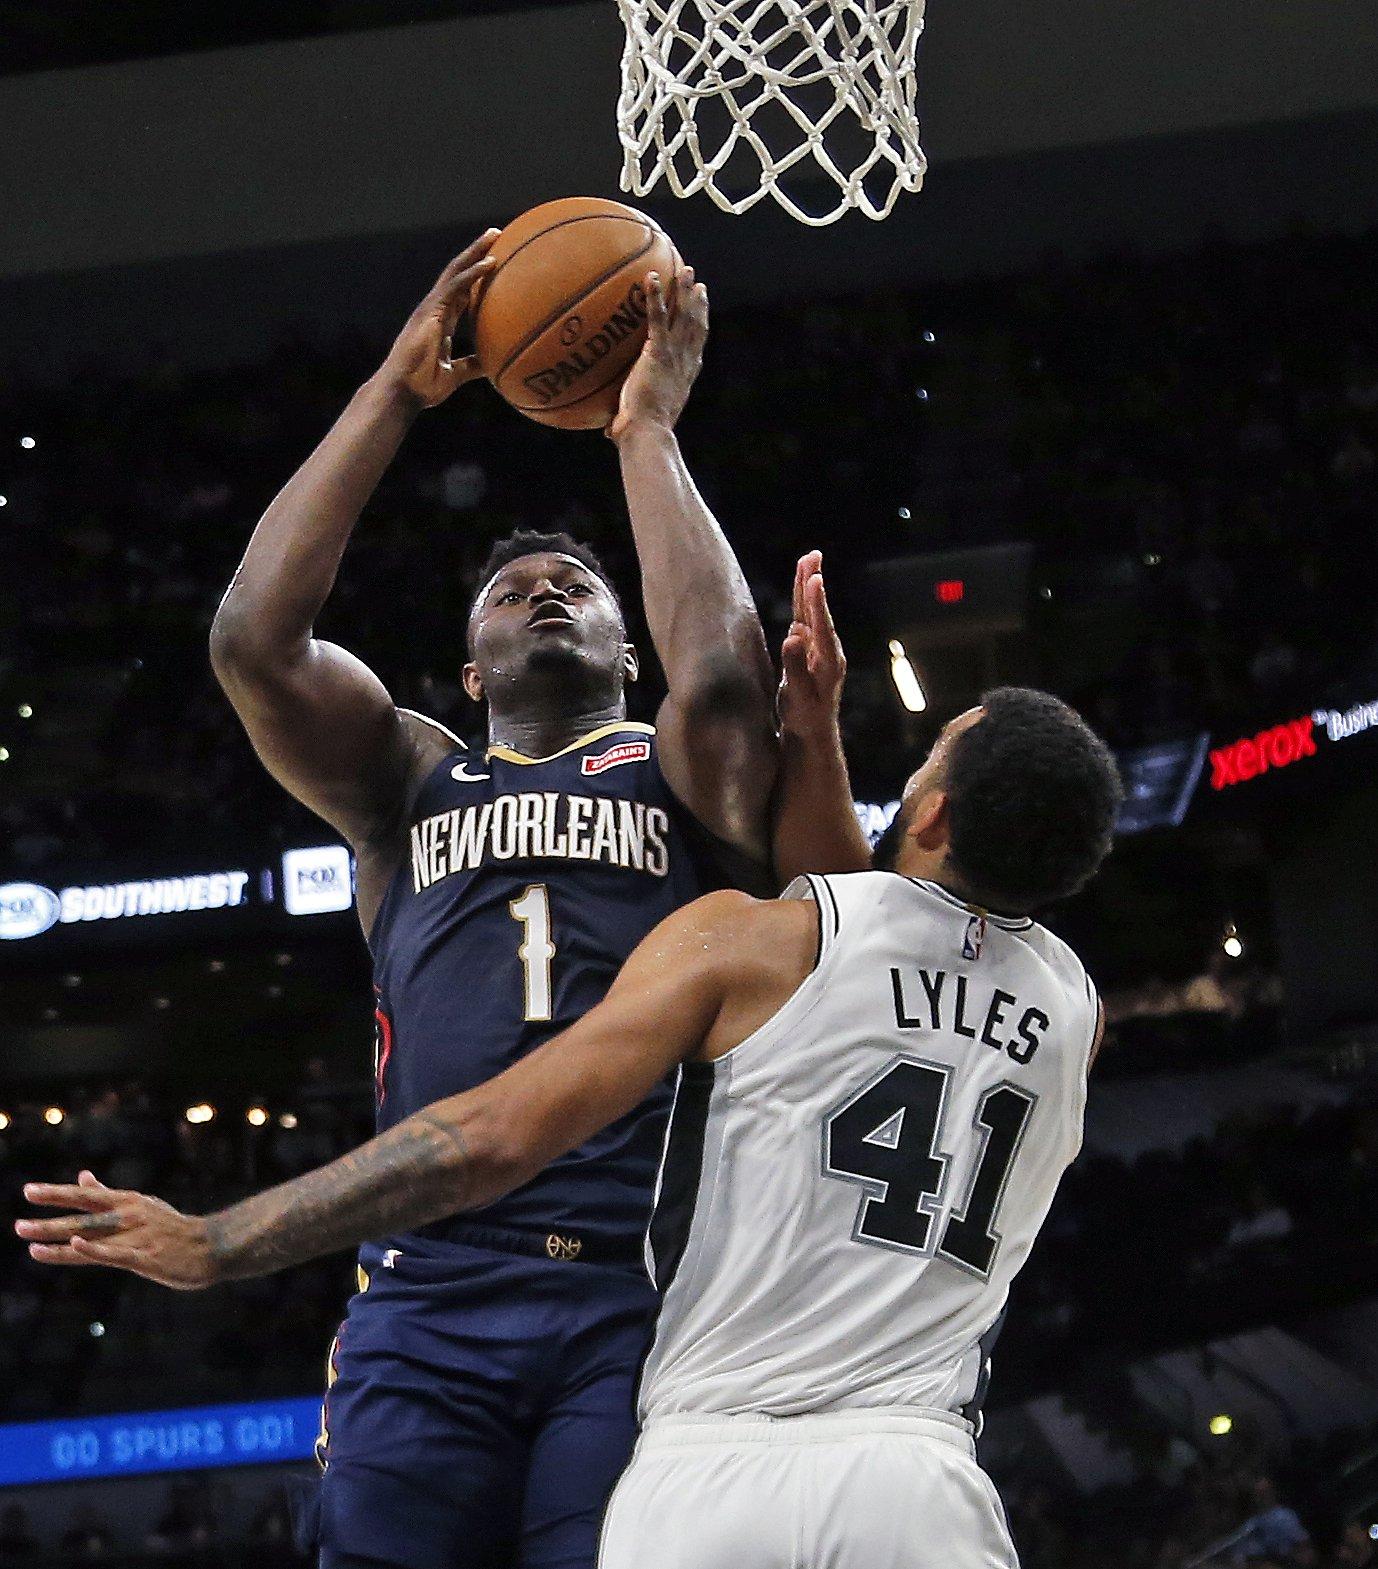 ESPN to televise Zion Williamson's return against Spurs